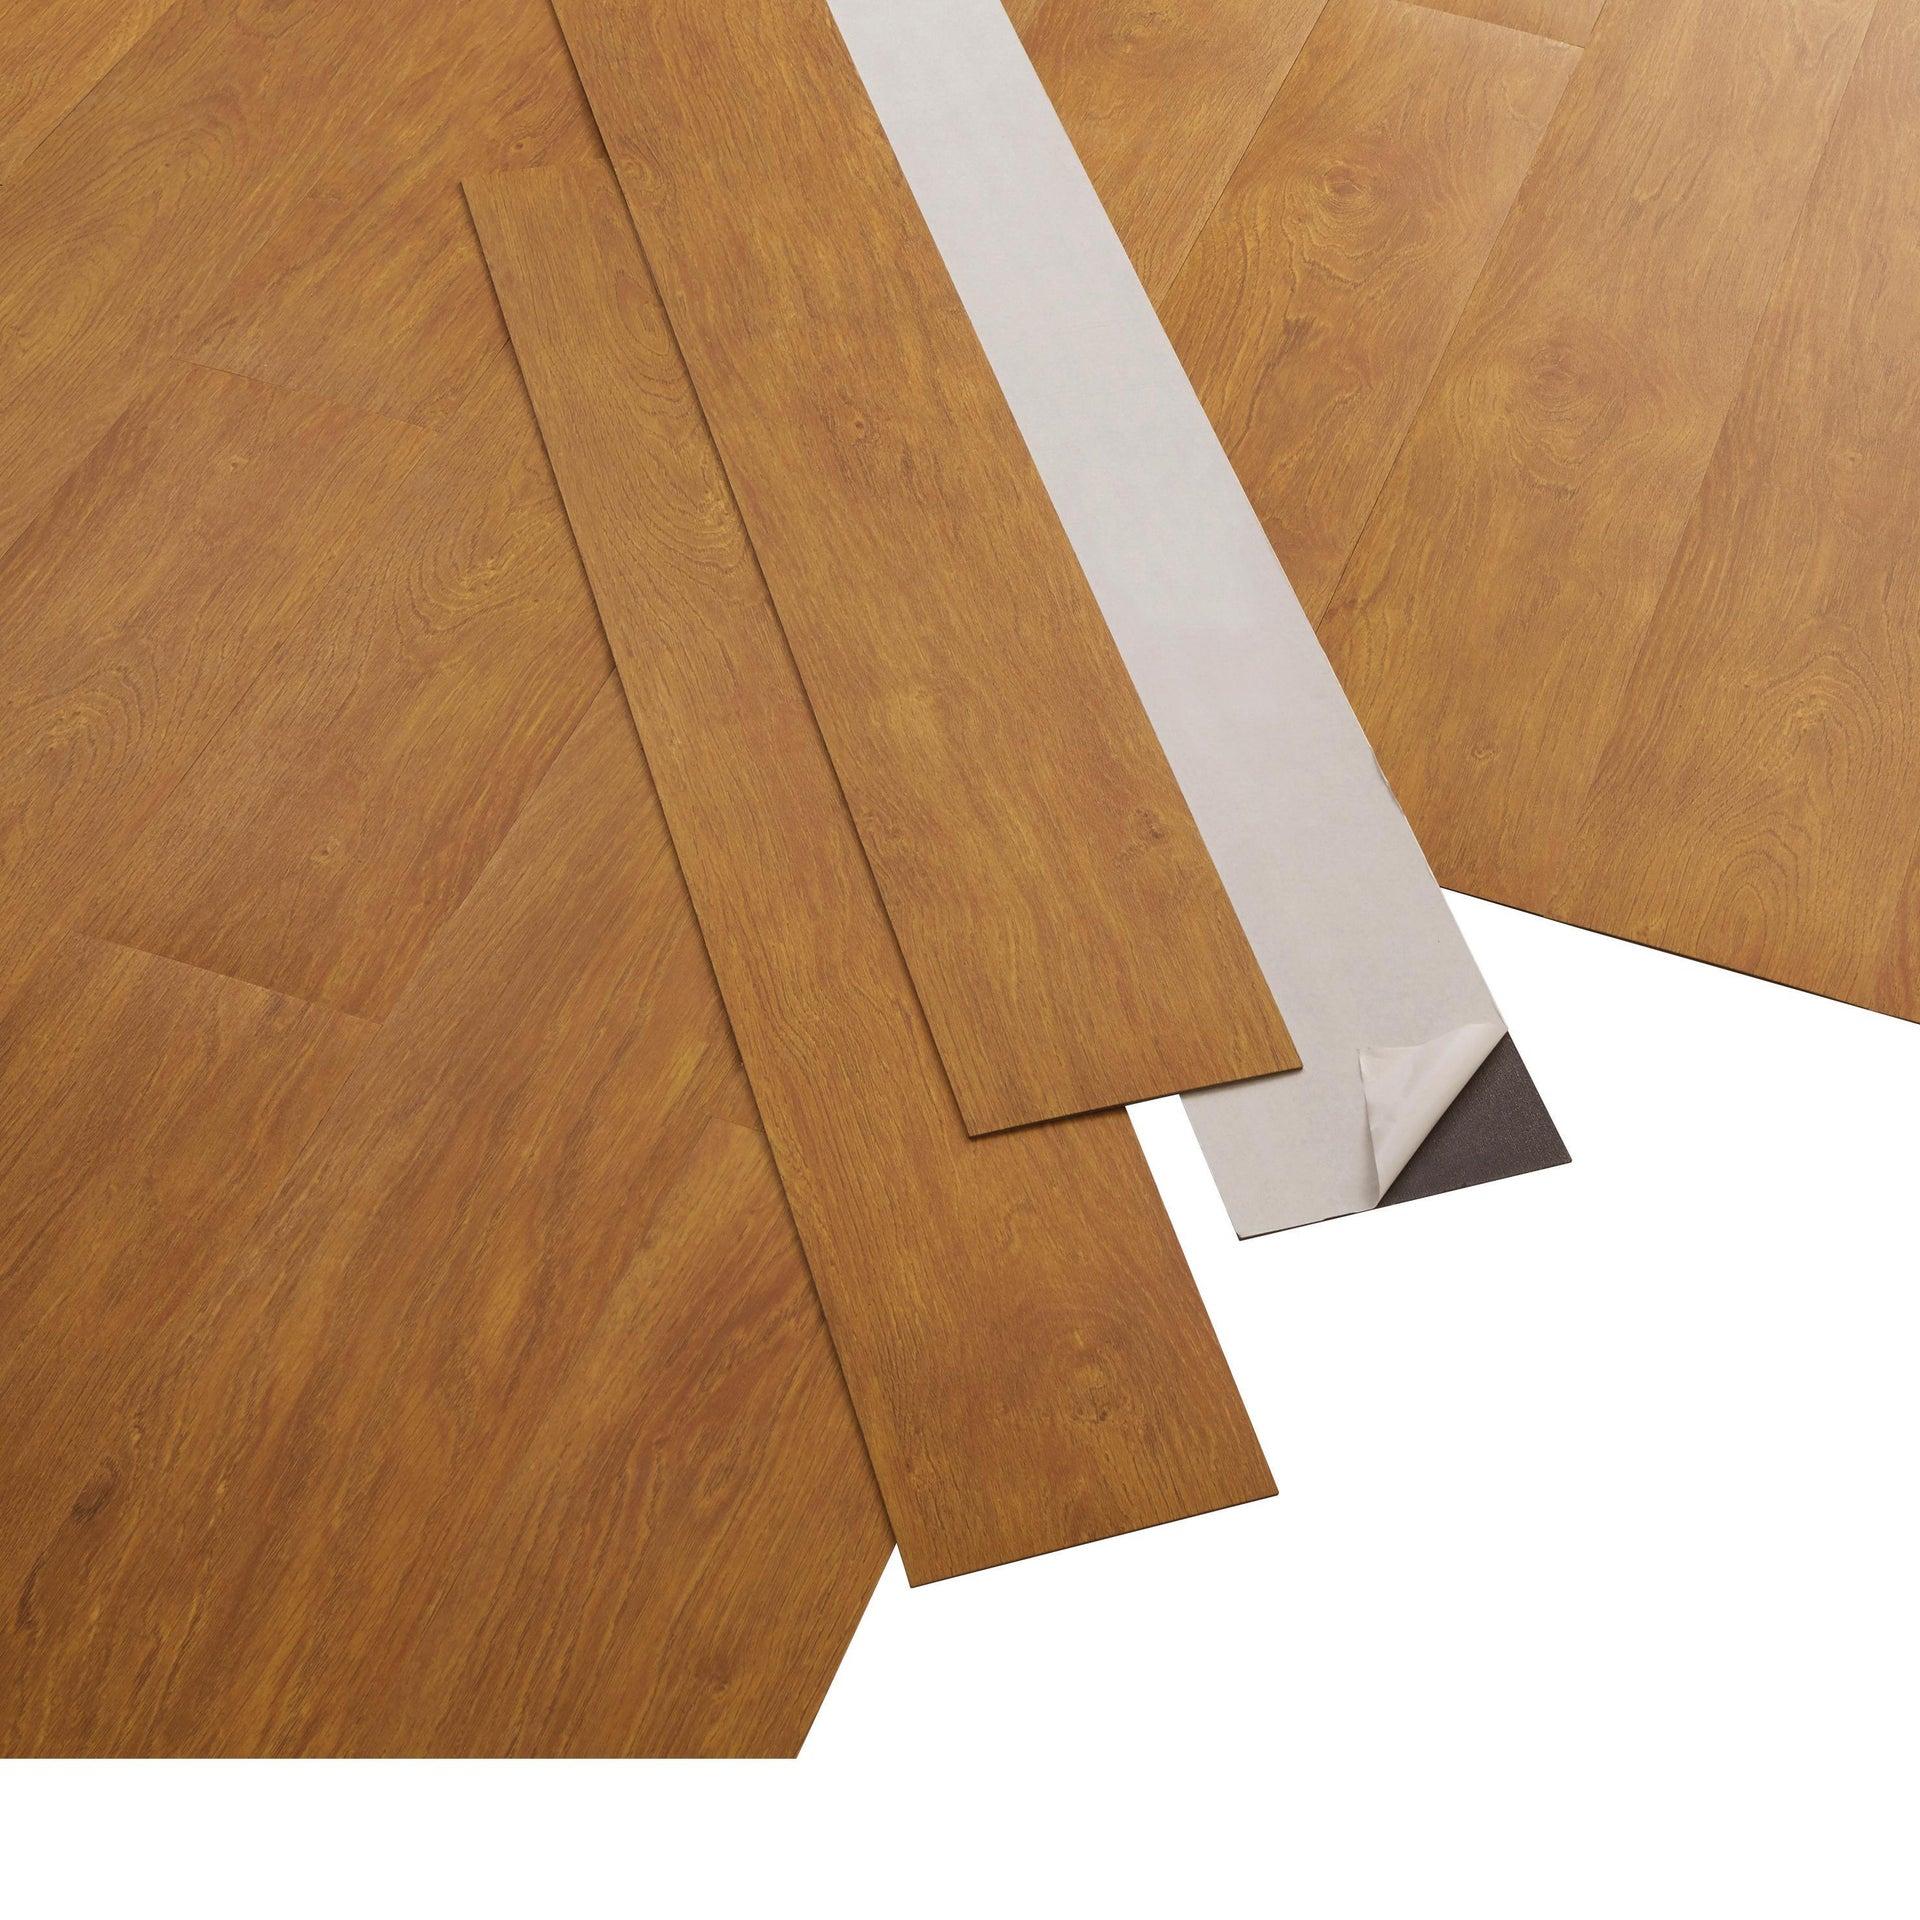 Pavimento PVC adesivo Obak Sp 1.8 mm marrone - 3